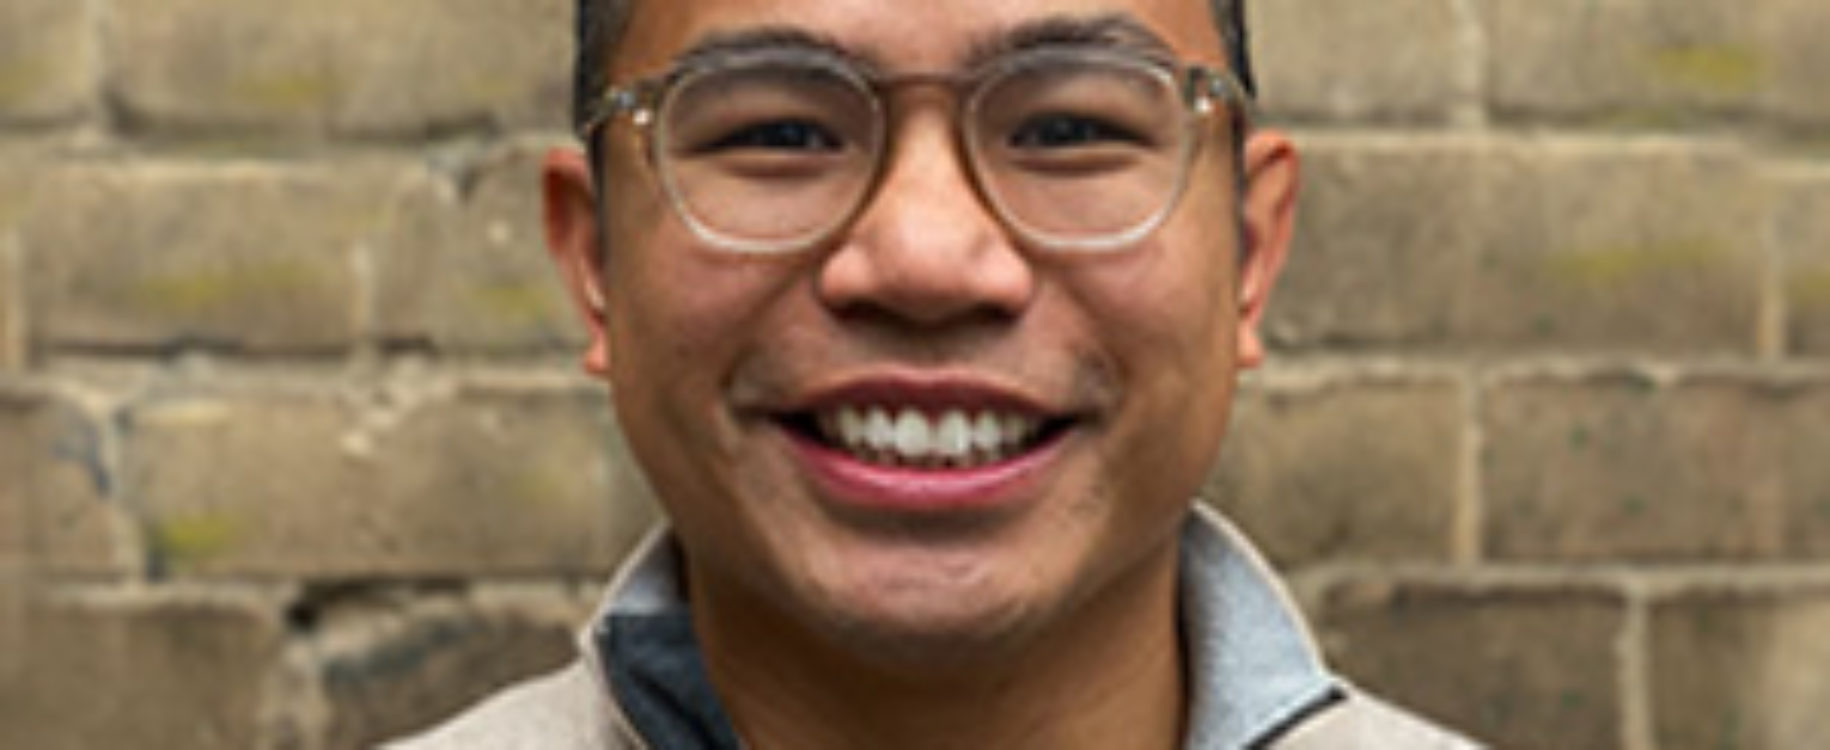 Bryan Dinh